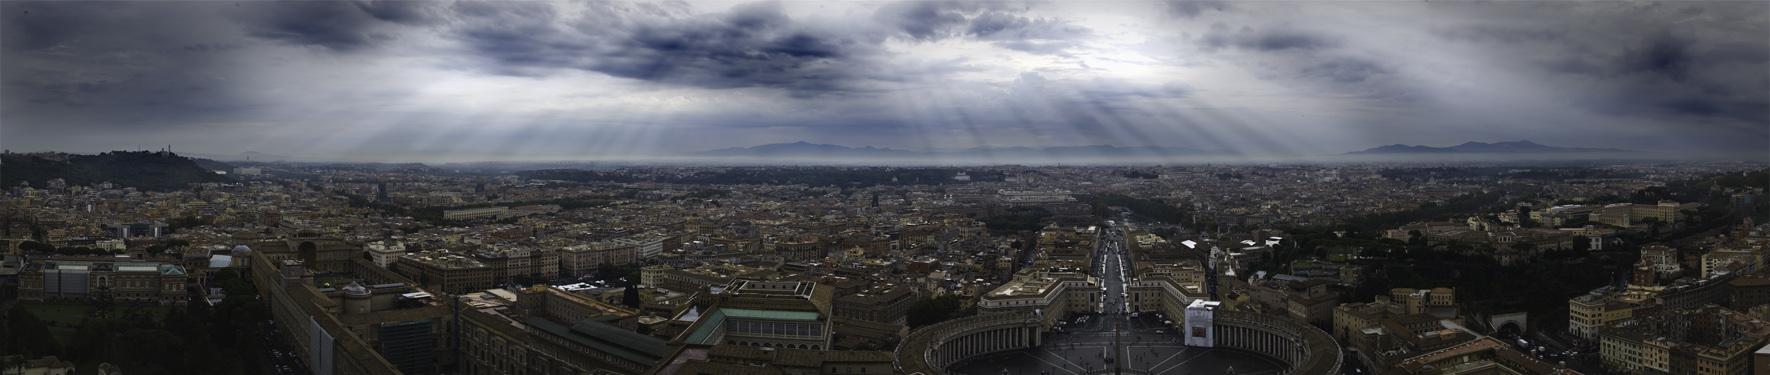 Rome panorama 2 by eiddesign